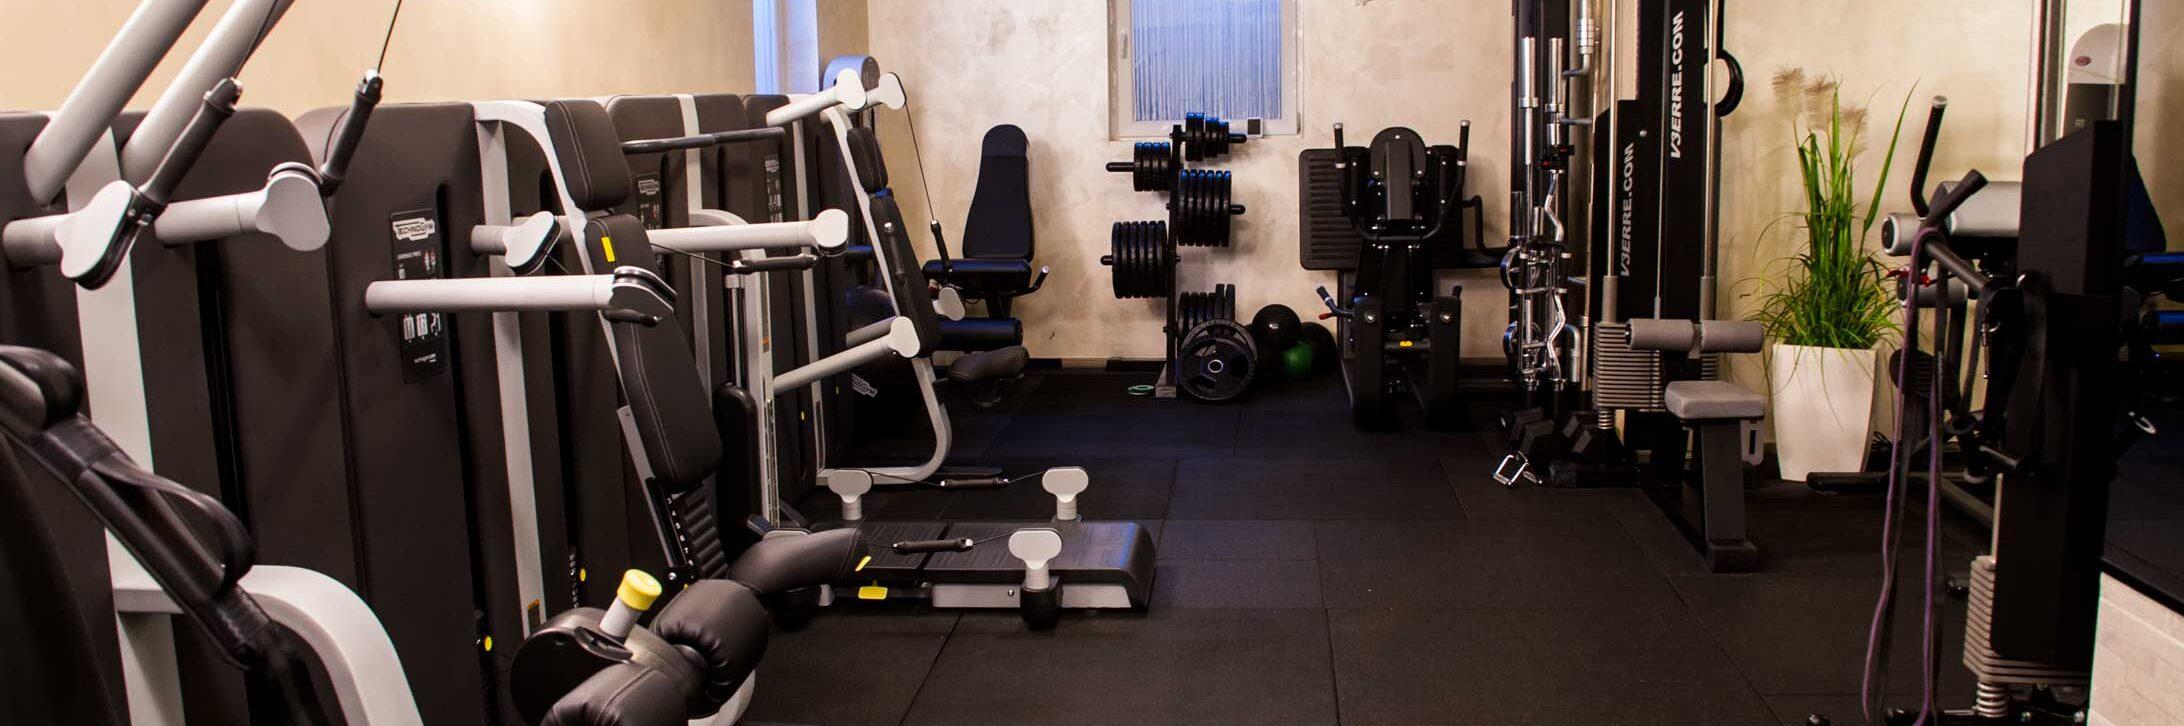 Palestra Dro Fitness